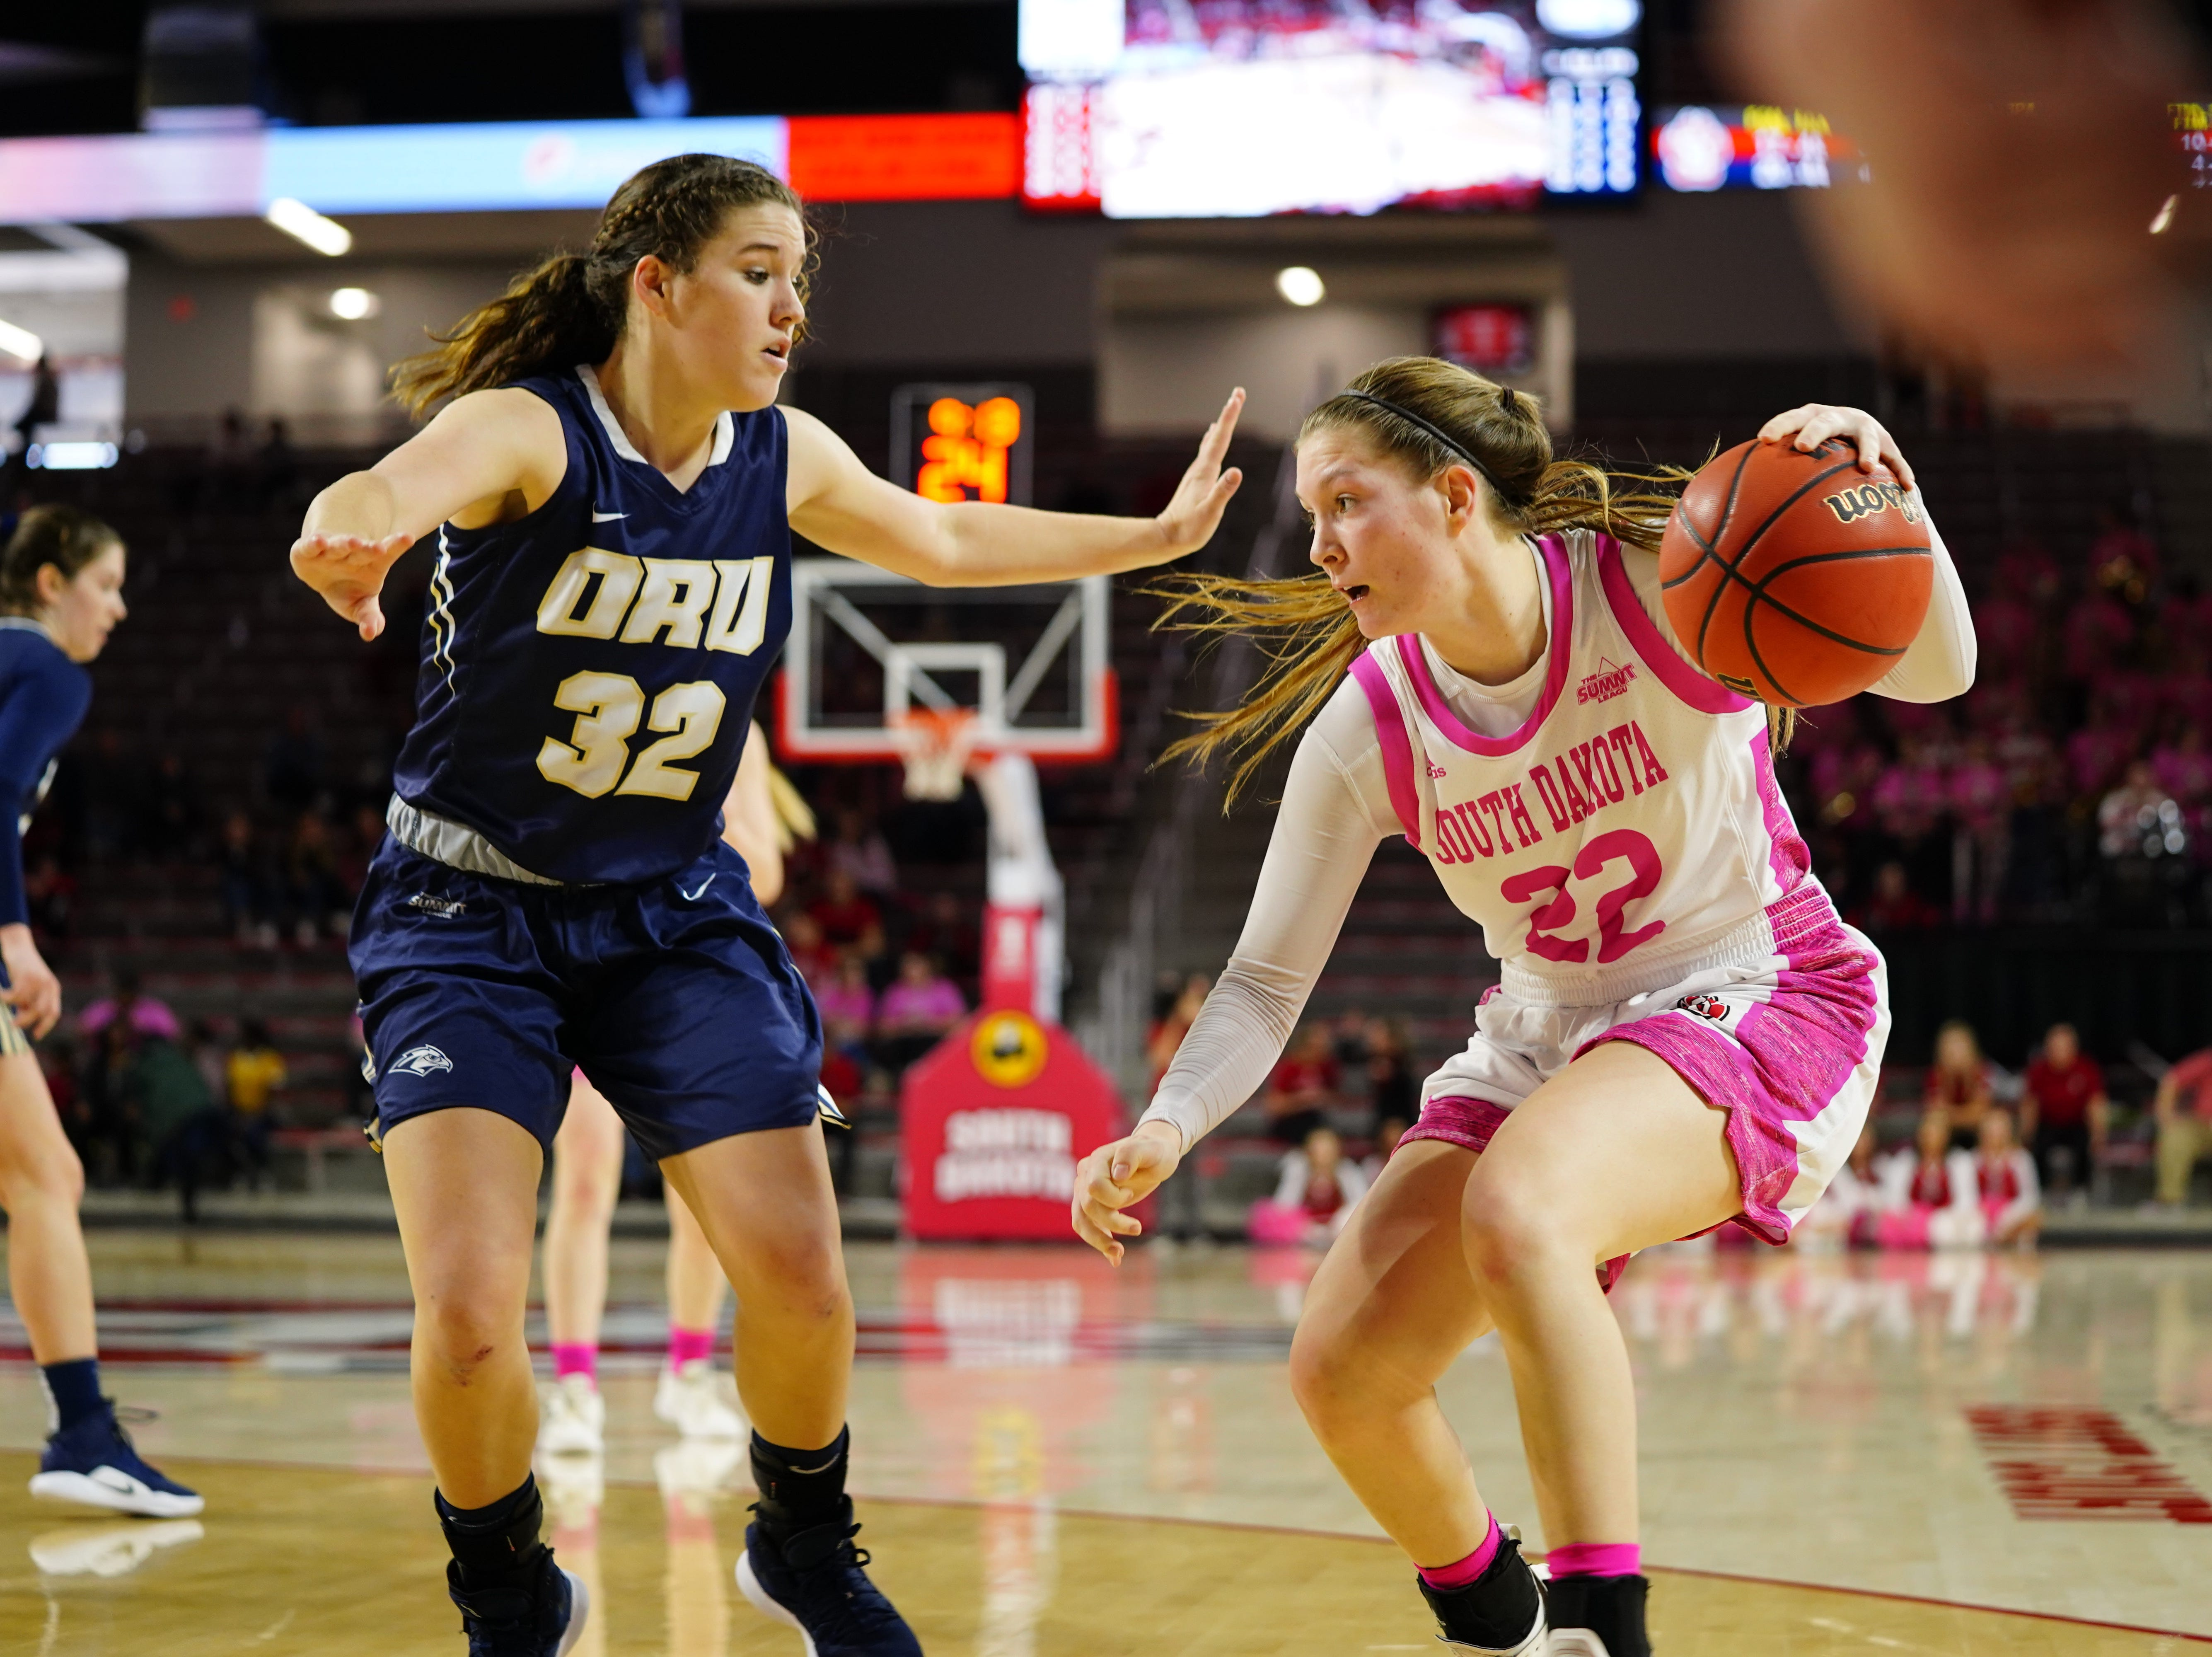 South Dakota guard Chloe Lamb tries to get around a defender against Oral Roberts on Saturday, Feb. 9, 2019.